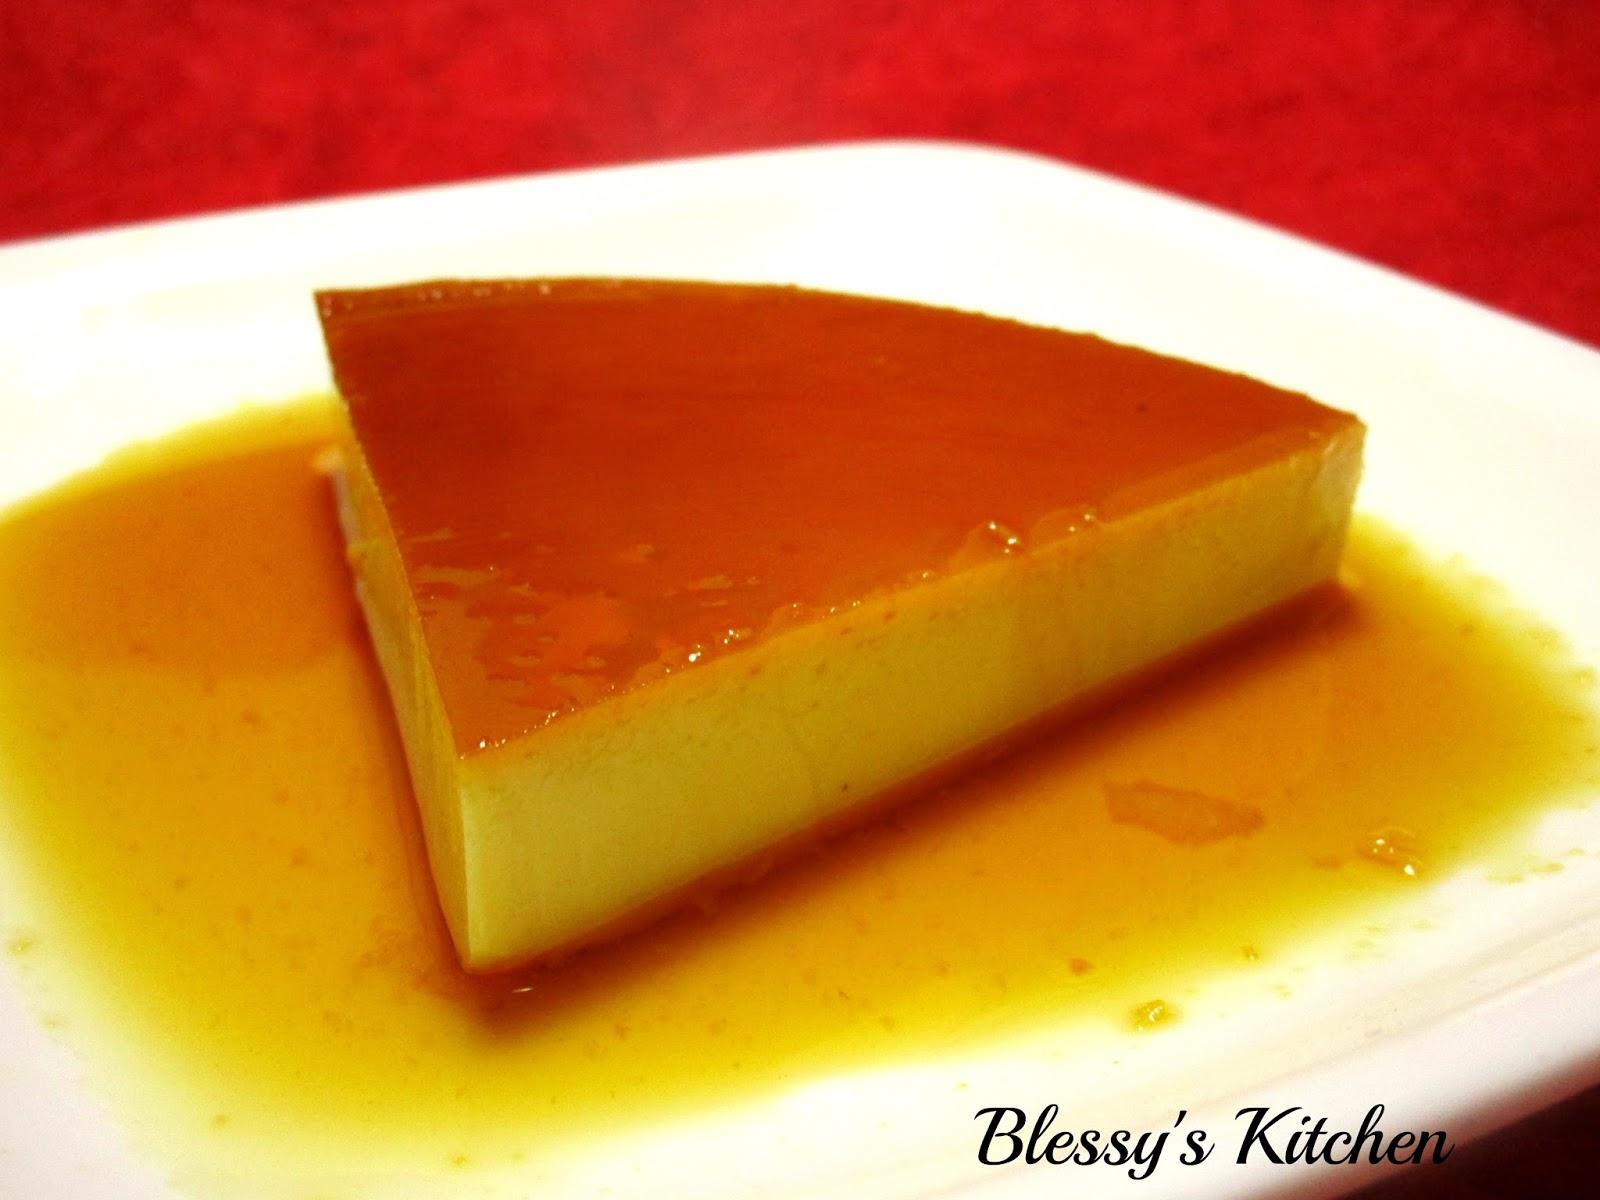 Blessy's Kitchen: Leche Flan/ Caramel Custard/ Caramel ...